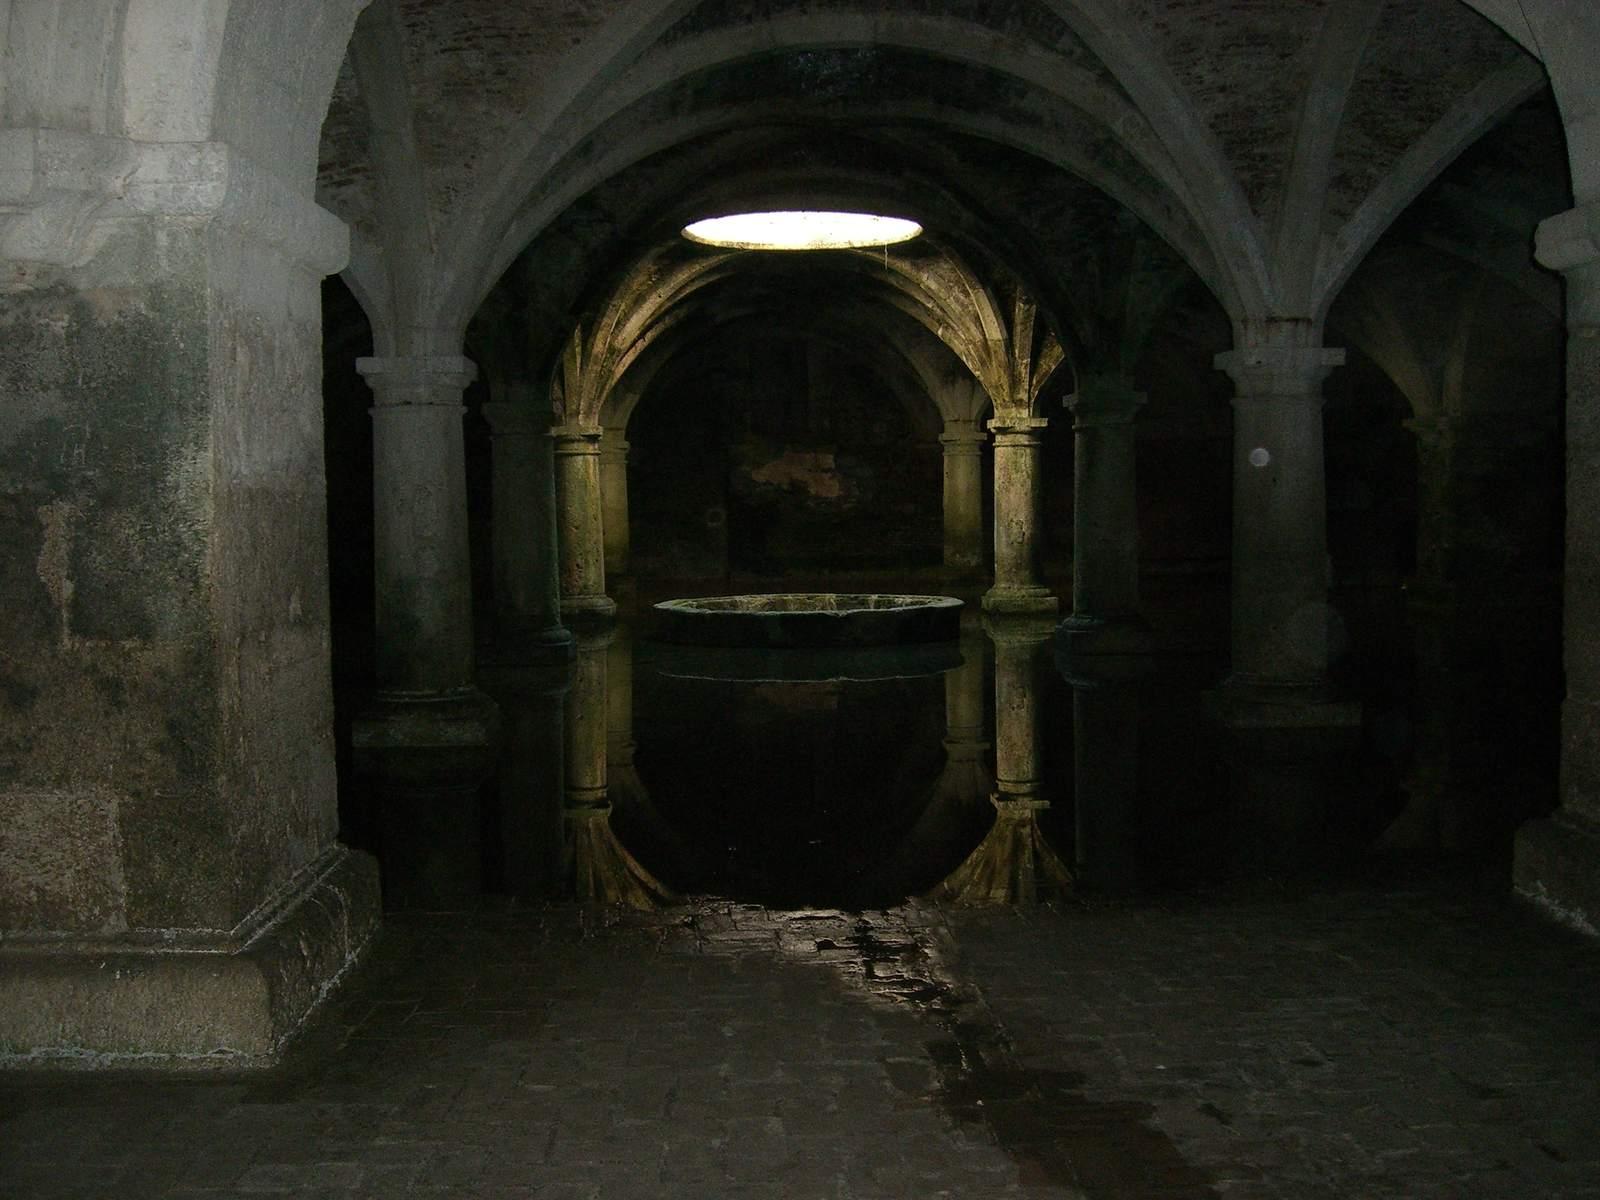 el jadida4 Portuguese El Jadida Cistern, Morocco